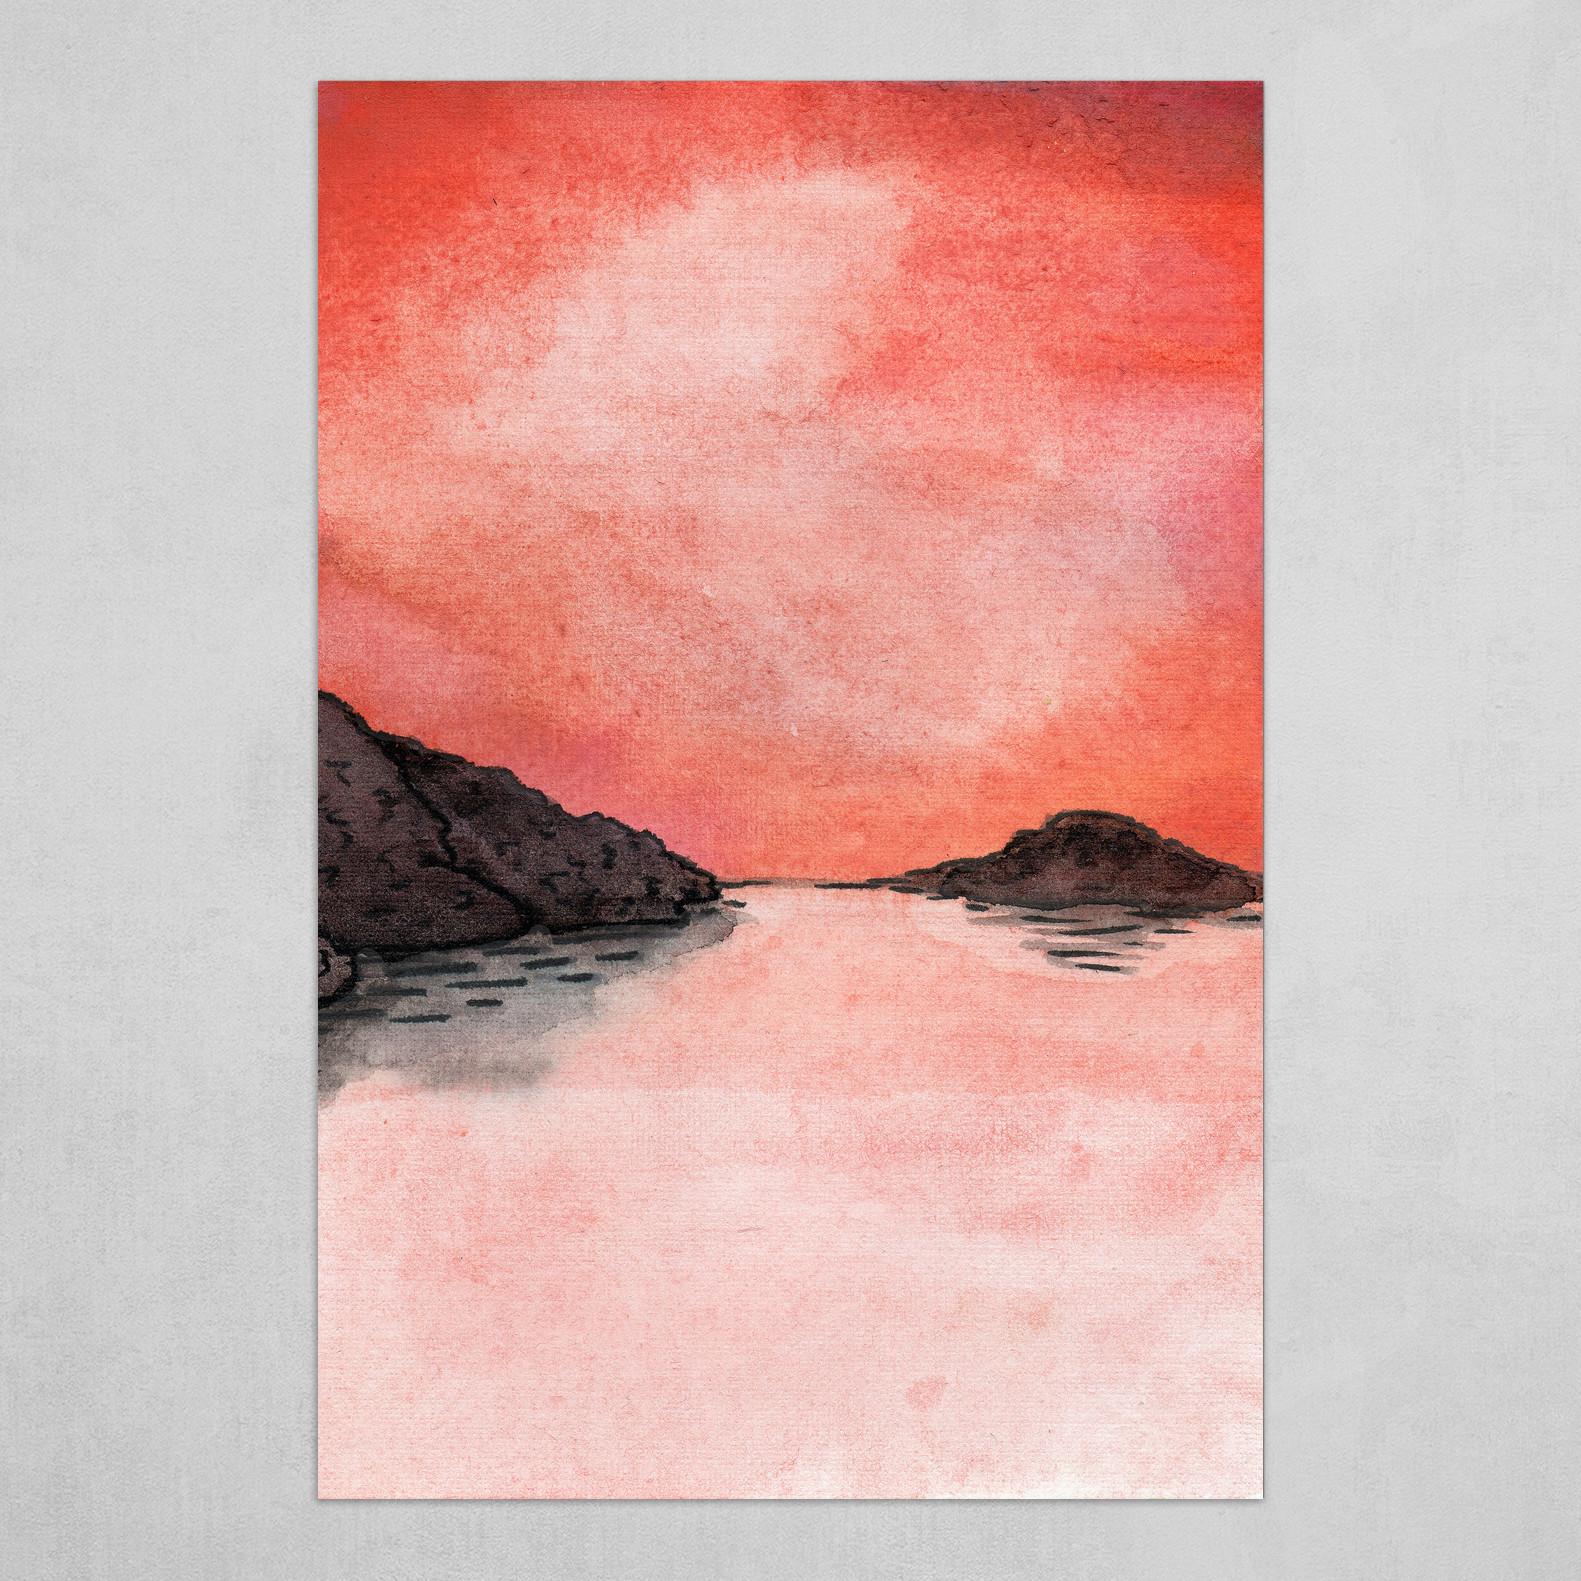 Watercolor Painting Sunset On The Sea Hd Metal Print By Evgeniya Varaksina